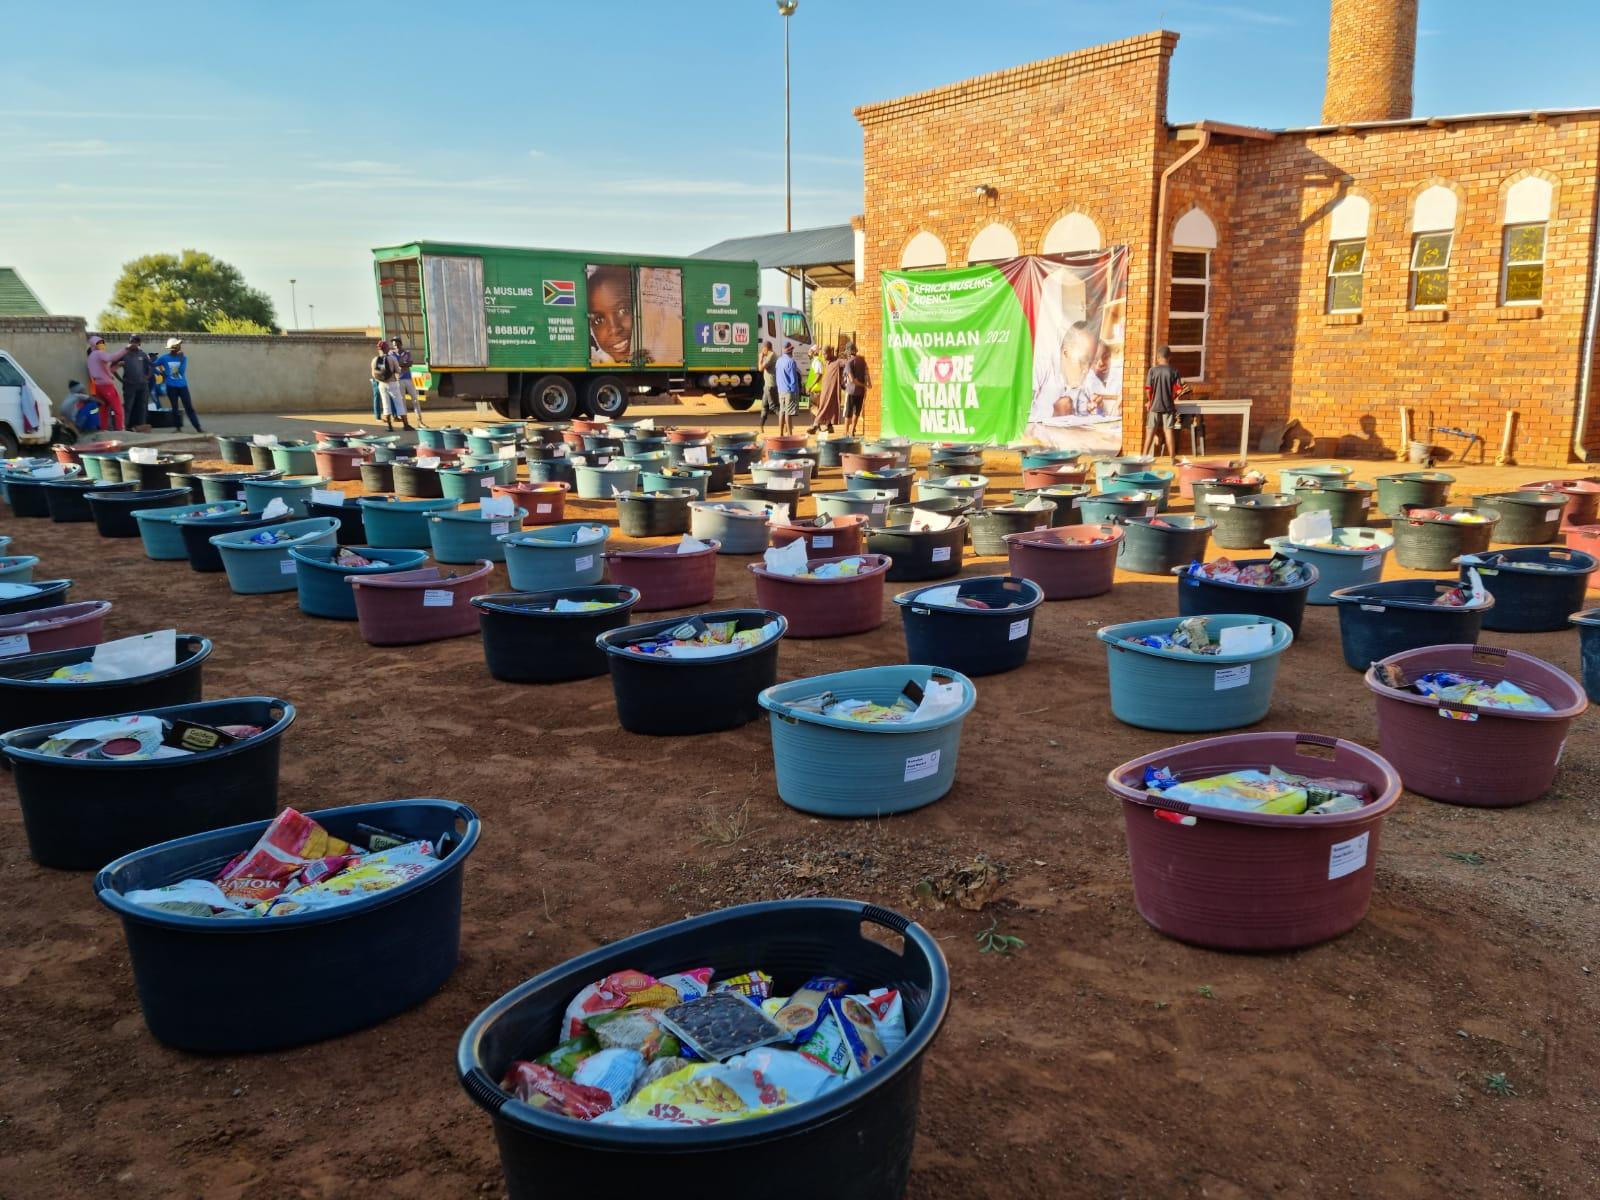 Food hampers lined up for distribution